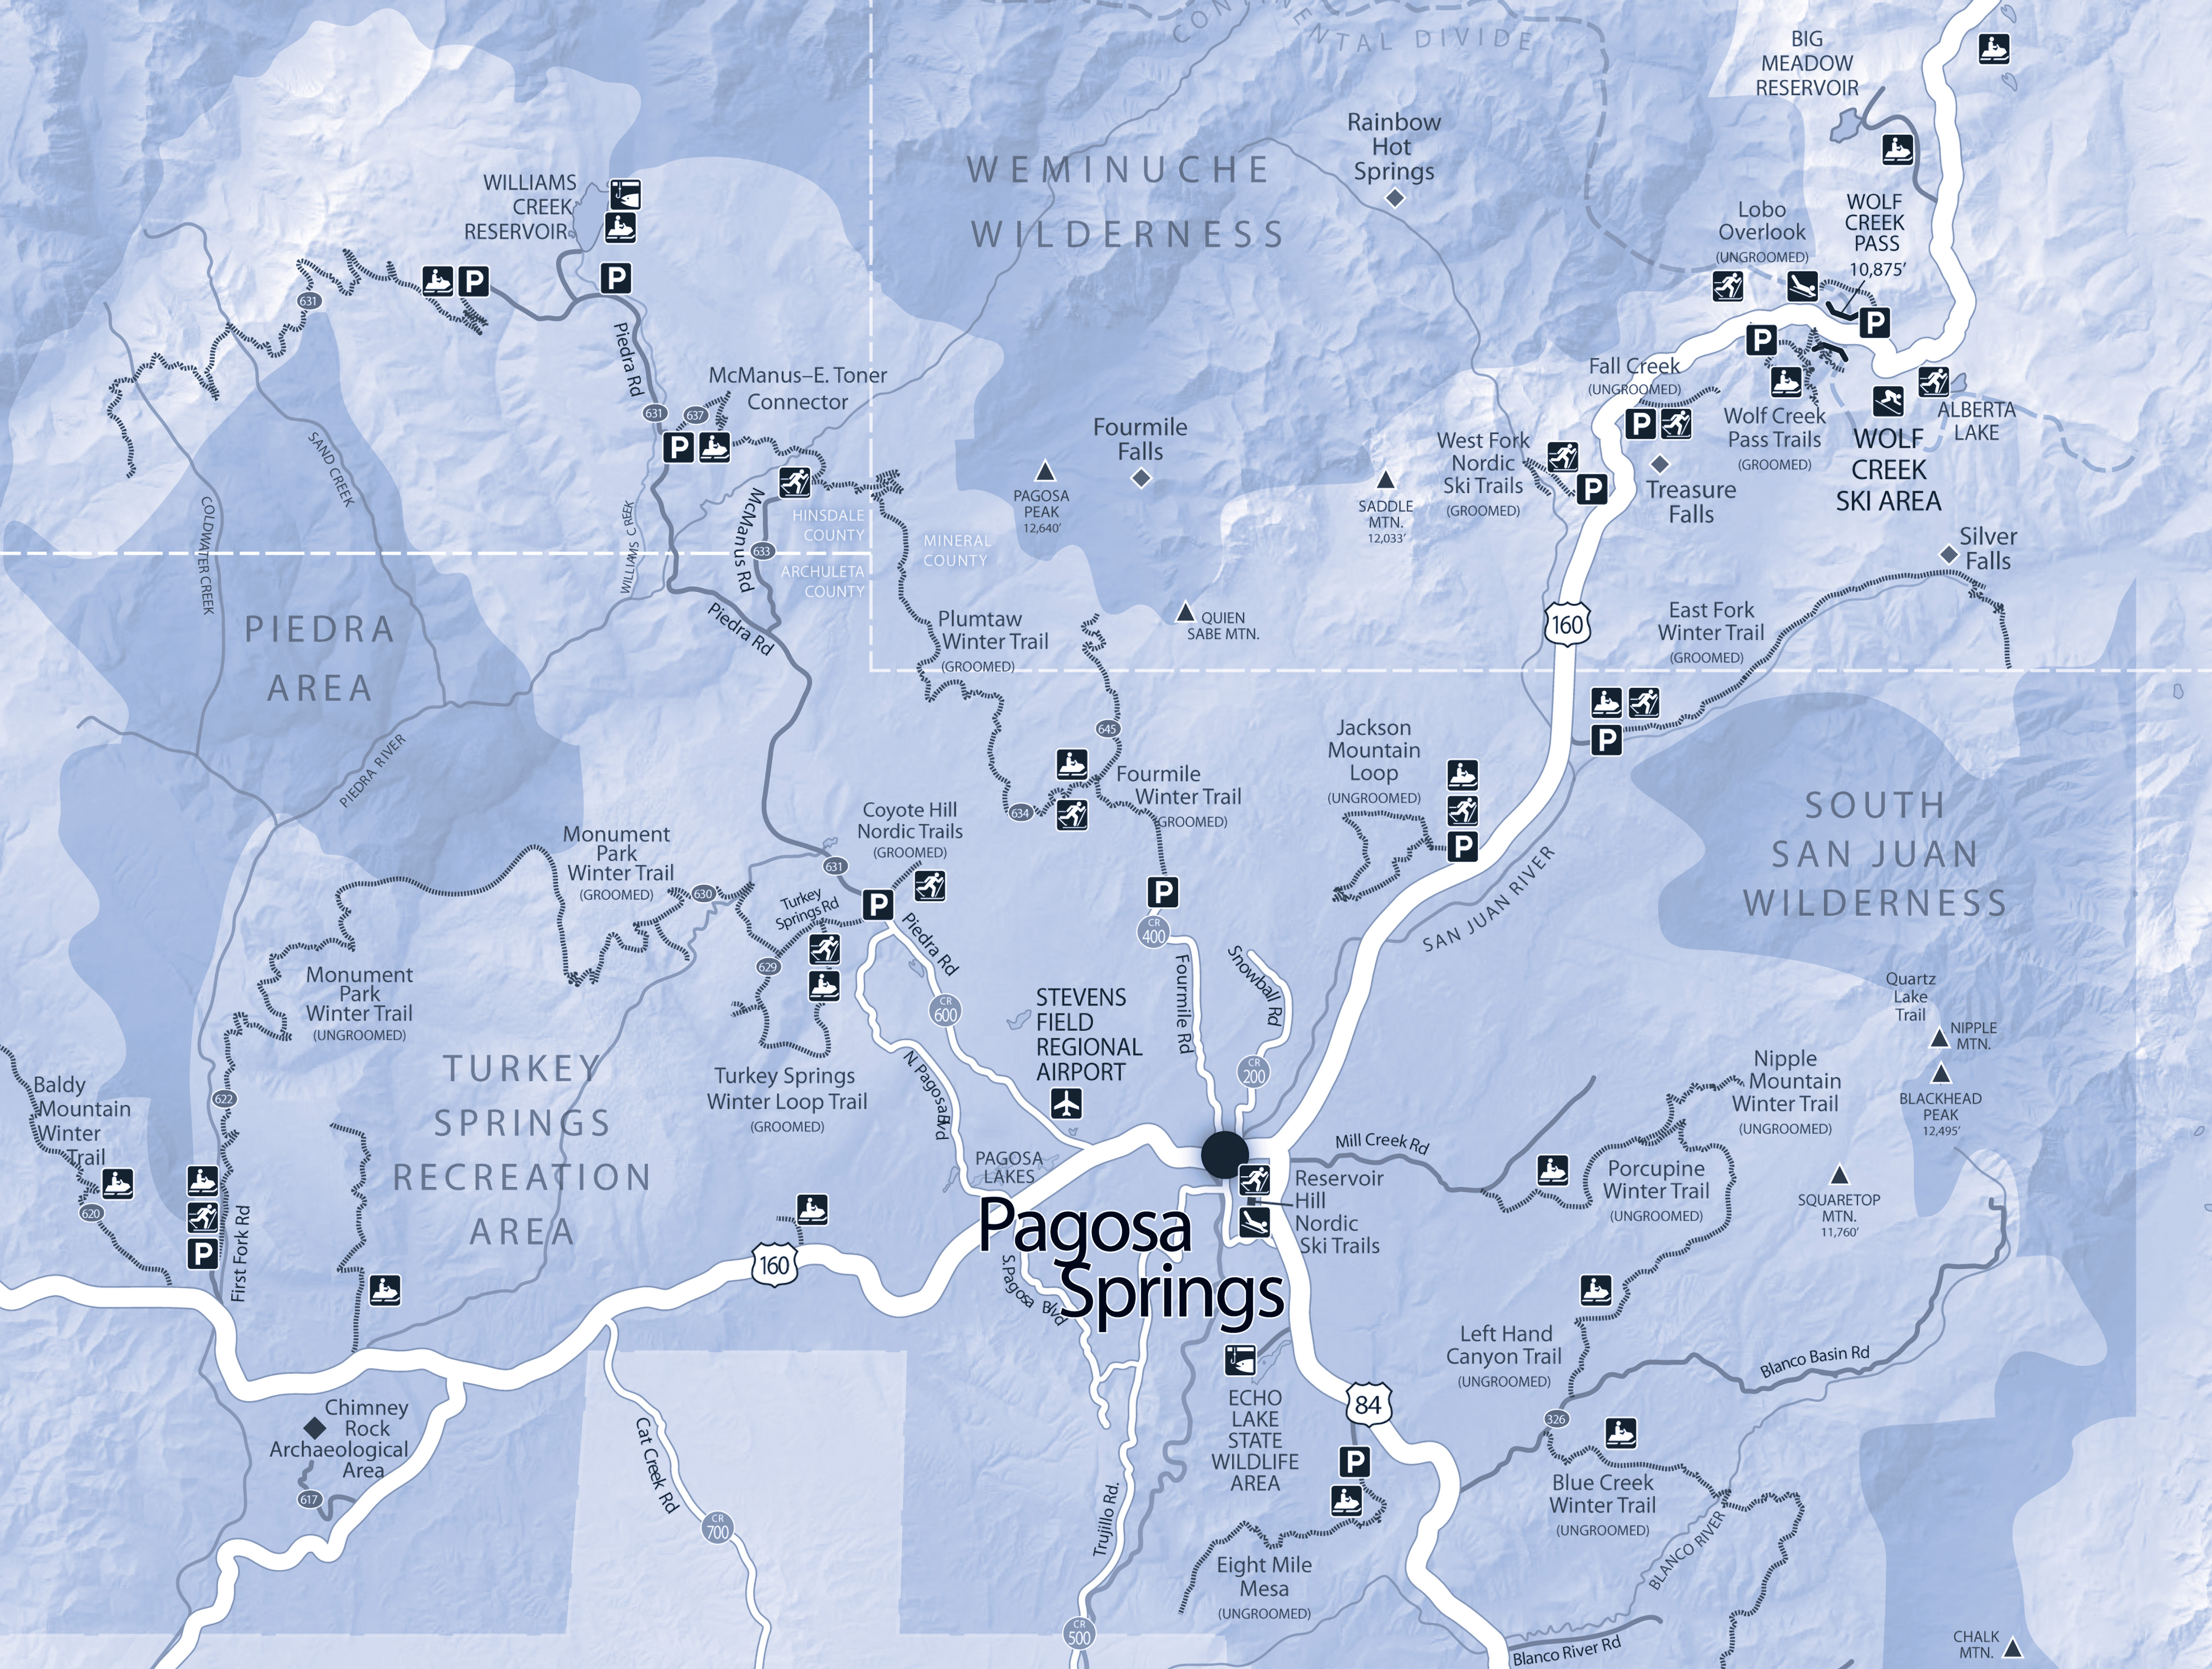 Calendar Kindergarten Zip Code : Colorado springs zip code map printable search results